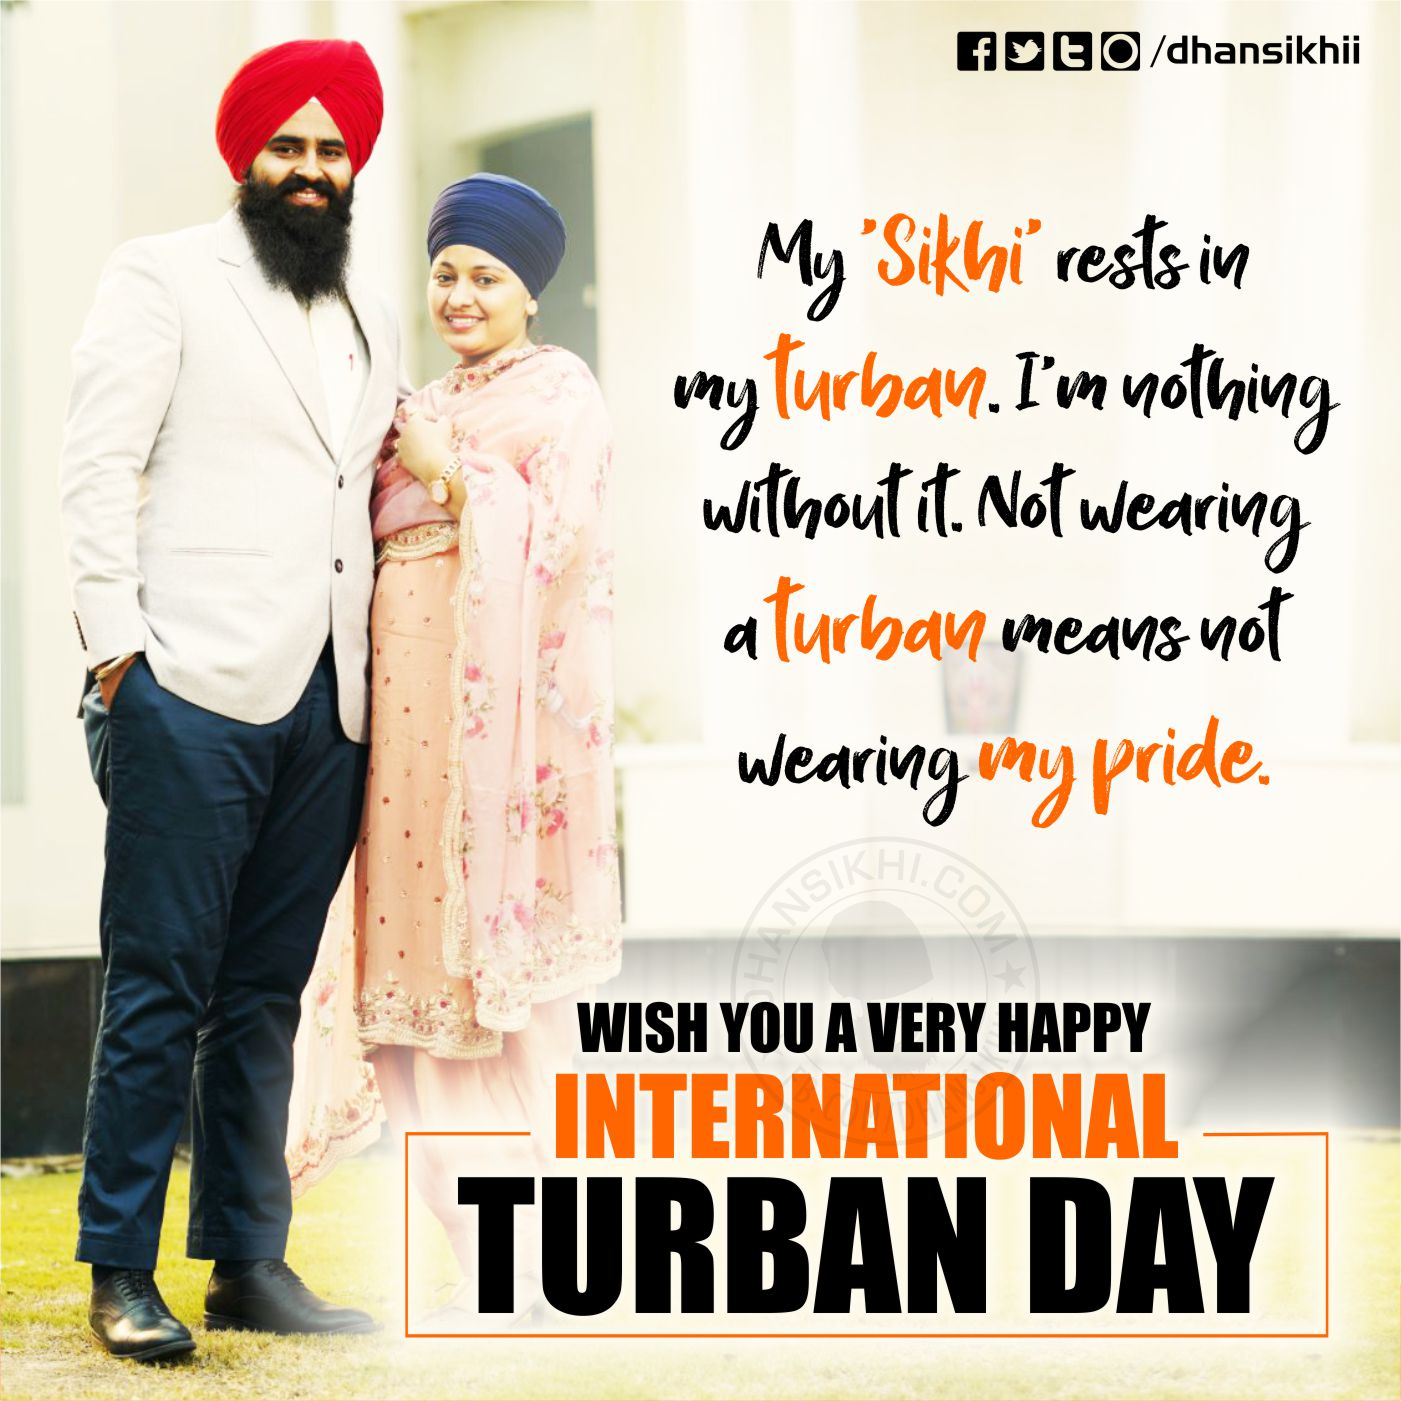 International Turban Day (Dastar Divas) Greetings